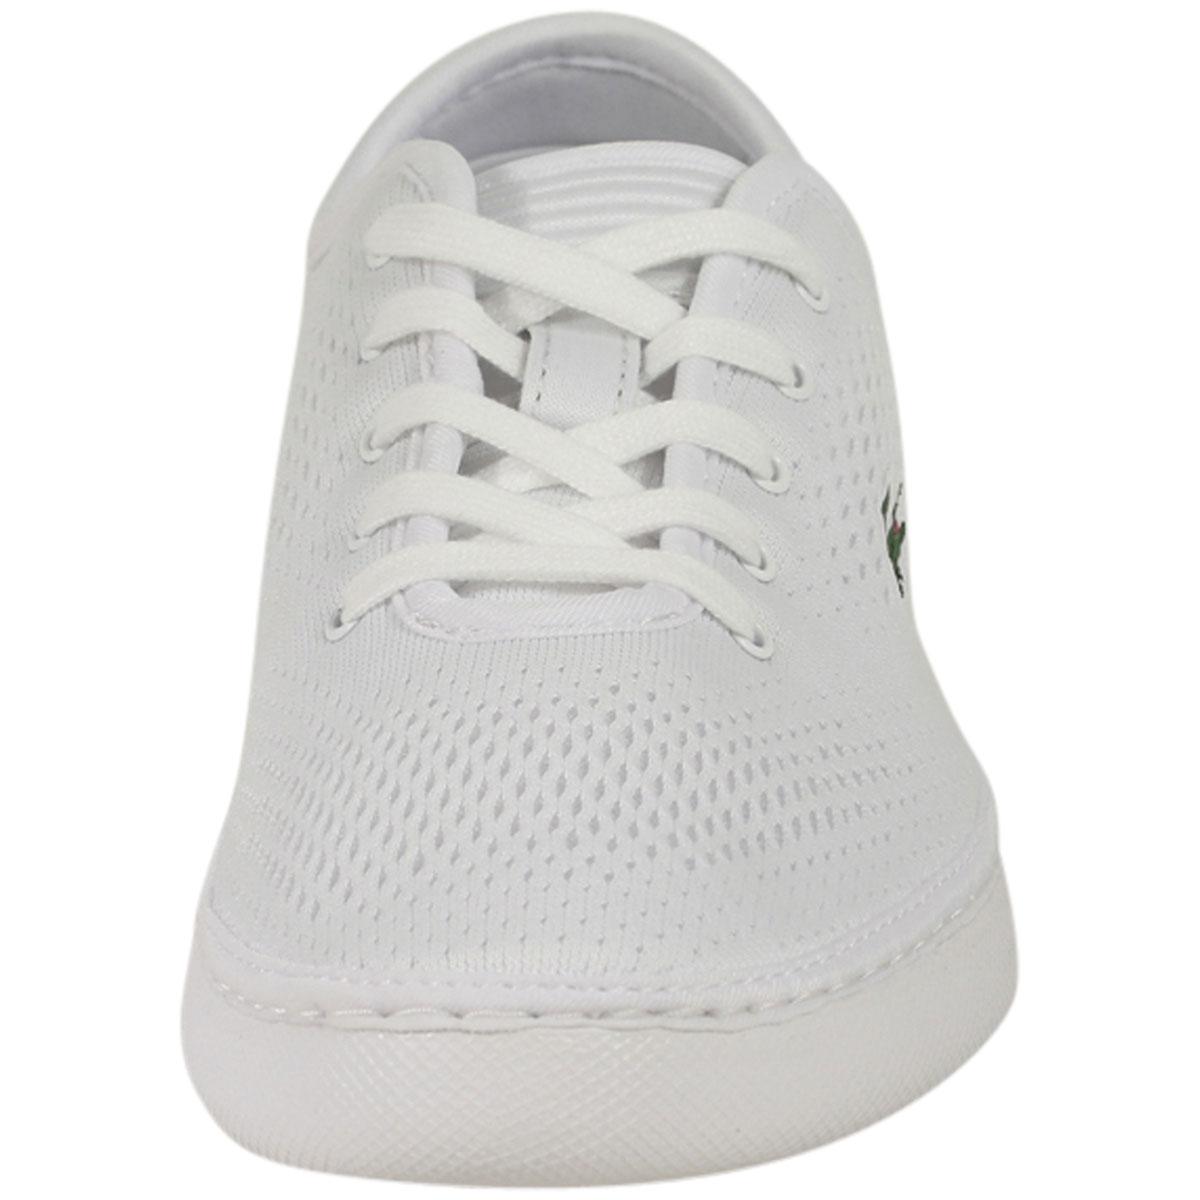 Lacoste-Men-039-s-L-Ydro-Lace-118-Trainers-Sneakers-Shoes thumbnail 22